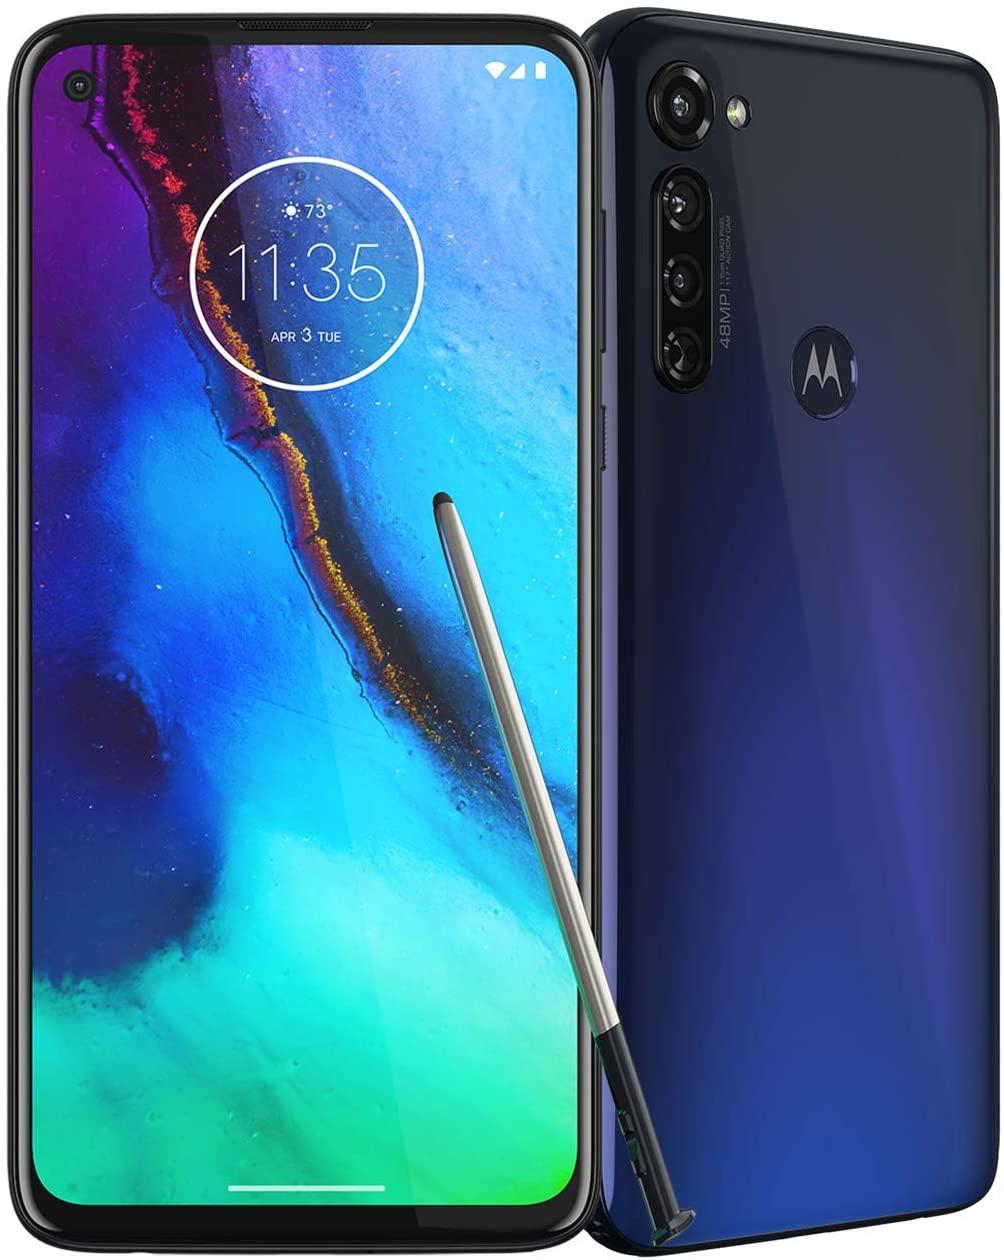 Amazon.com: Moto G Stylus | Unlocked | Made for US by Motorola | 4/128GB | 48MP Camera | 2020 | Indigo